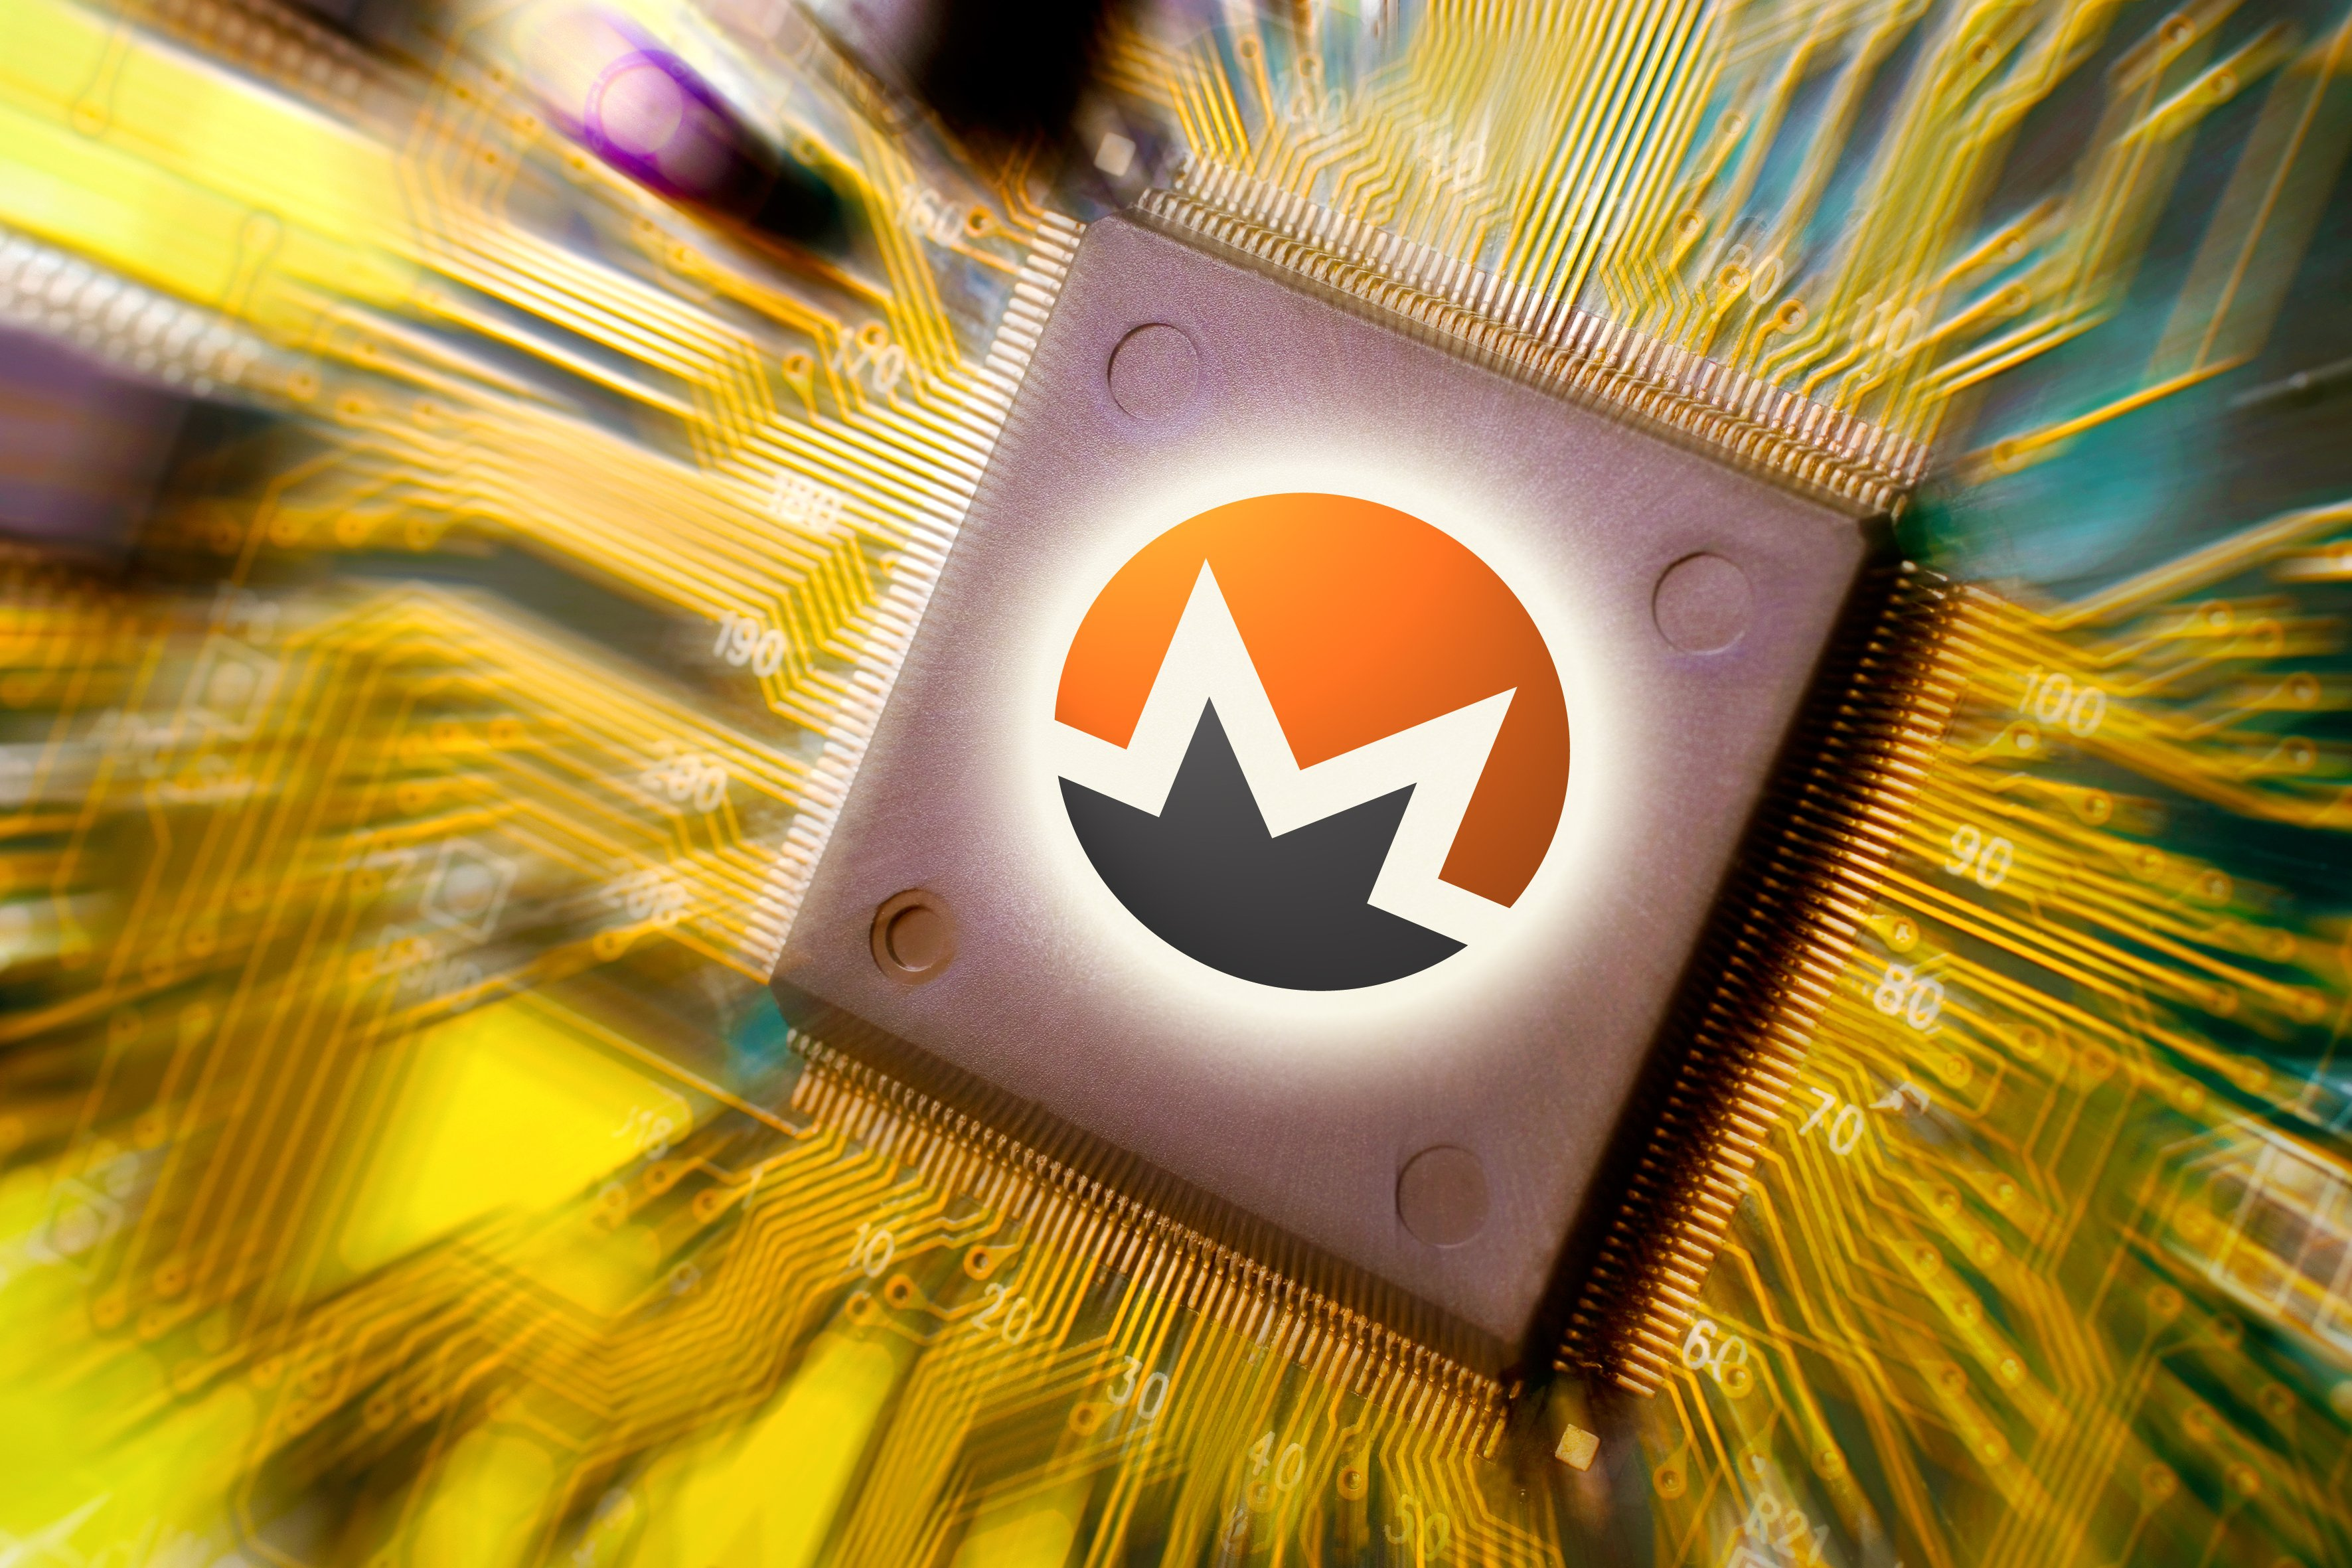 monero image on circuit board